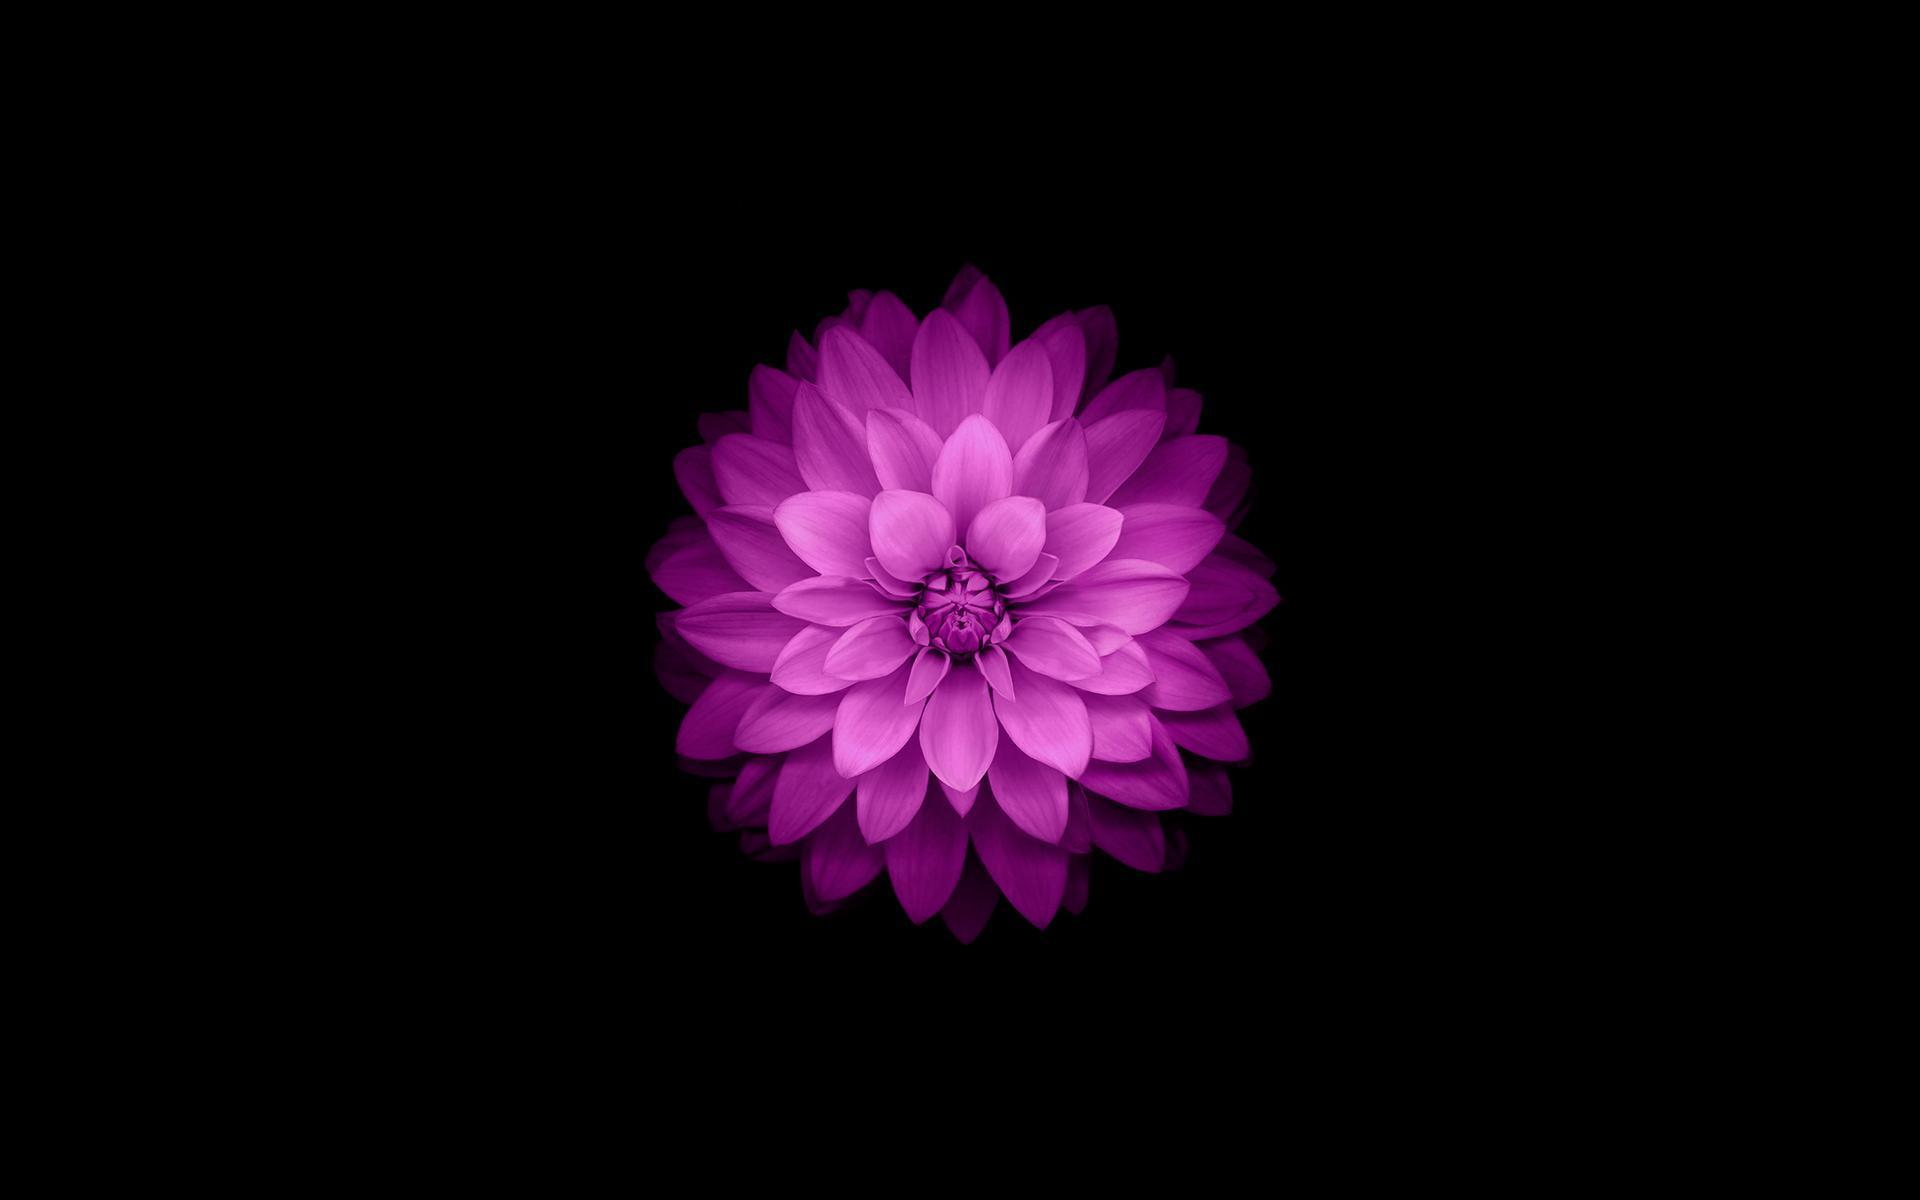 Dark Flower Wallpaper For Android Apk Download